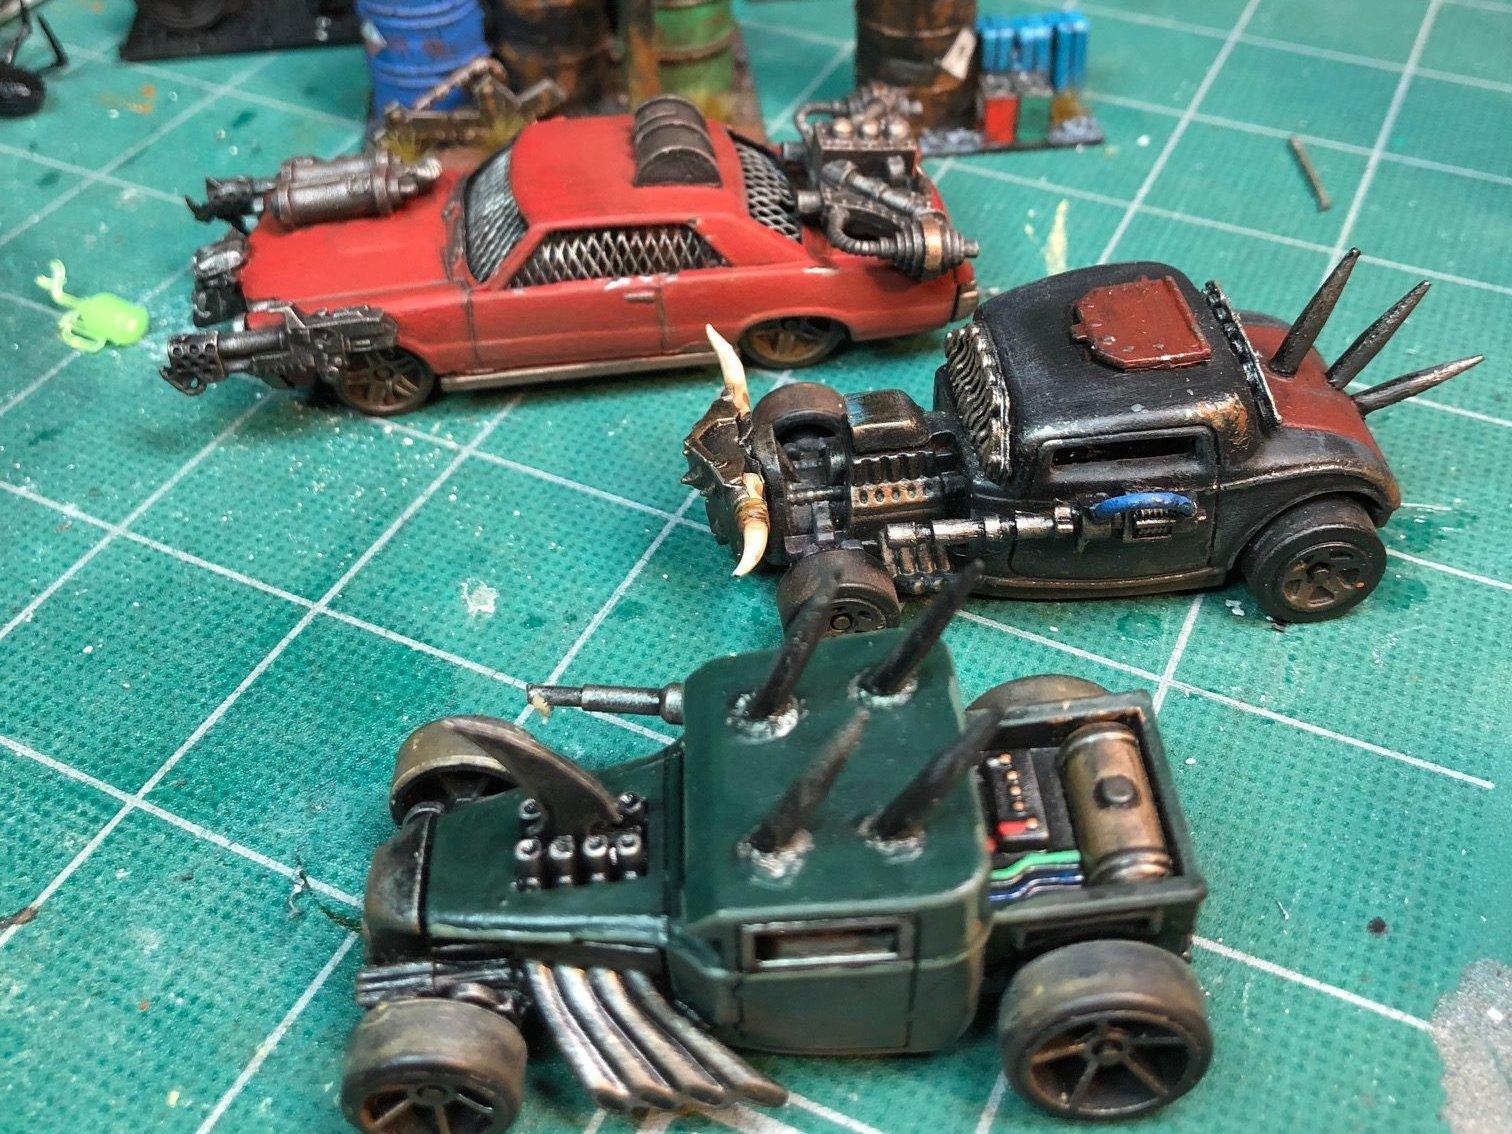 HOT WHEELS FULL SET OF 5 MAD DIE CAST CARS